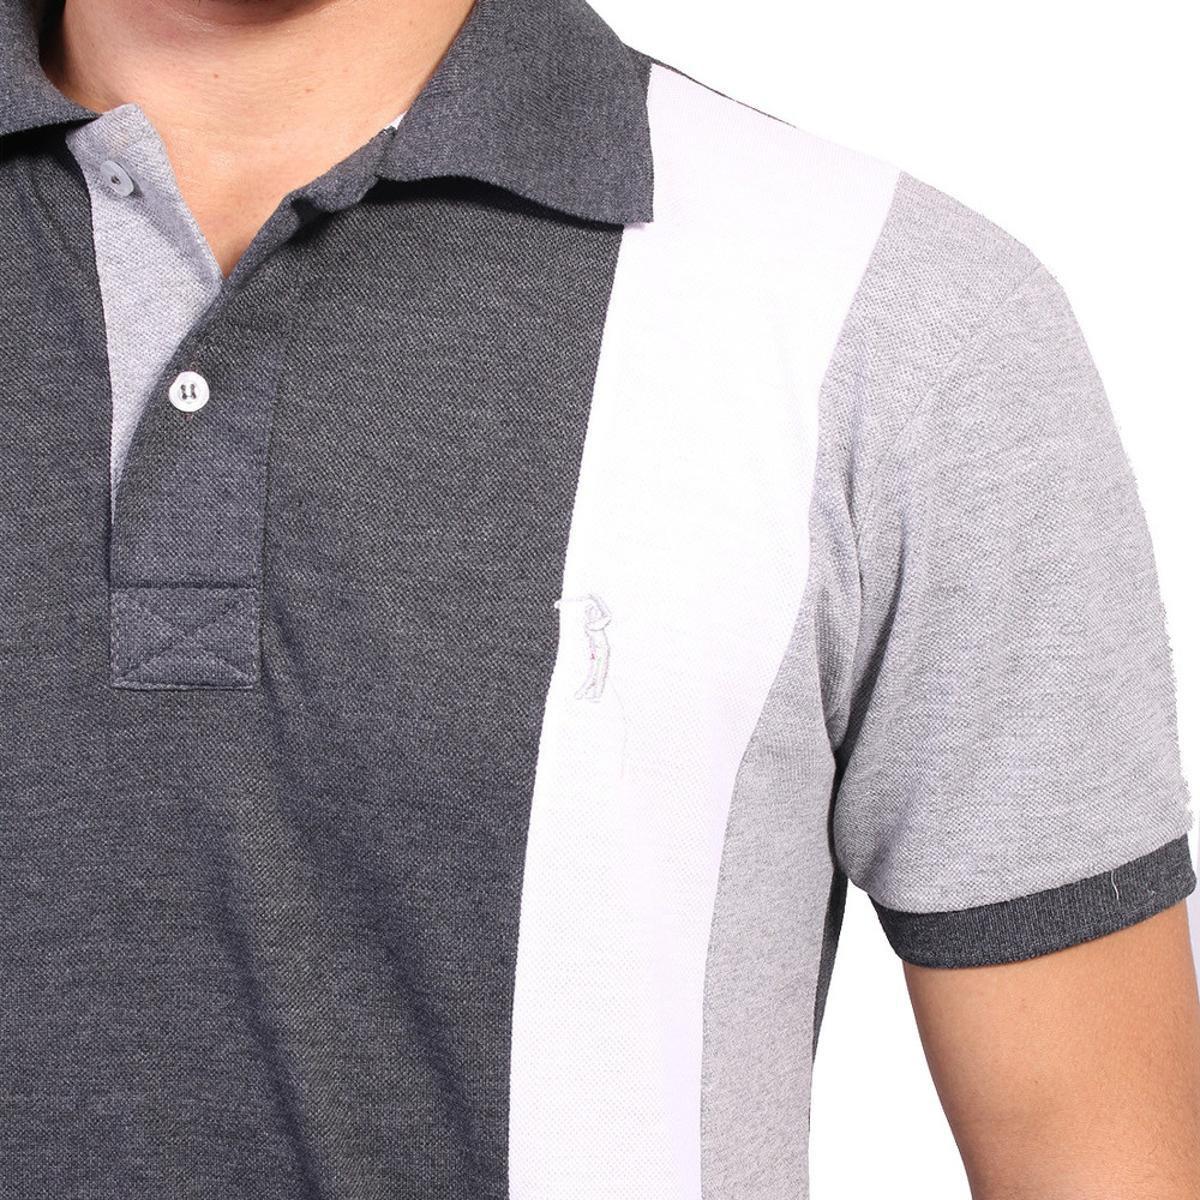 Camisa Polo Golf Club Listrada - Chumbo e Cinza - Compre Agora ... 170fcfa870fd9